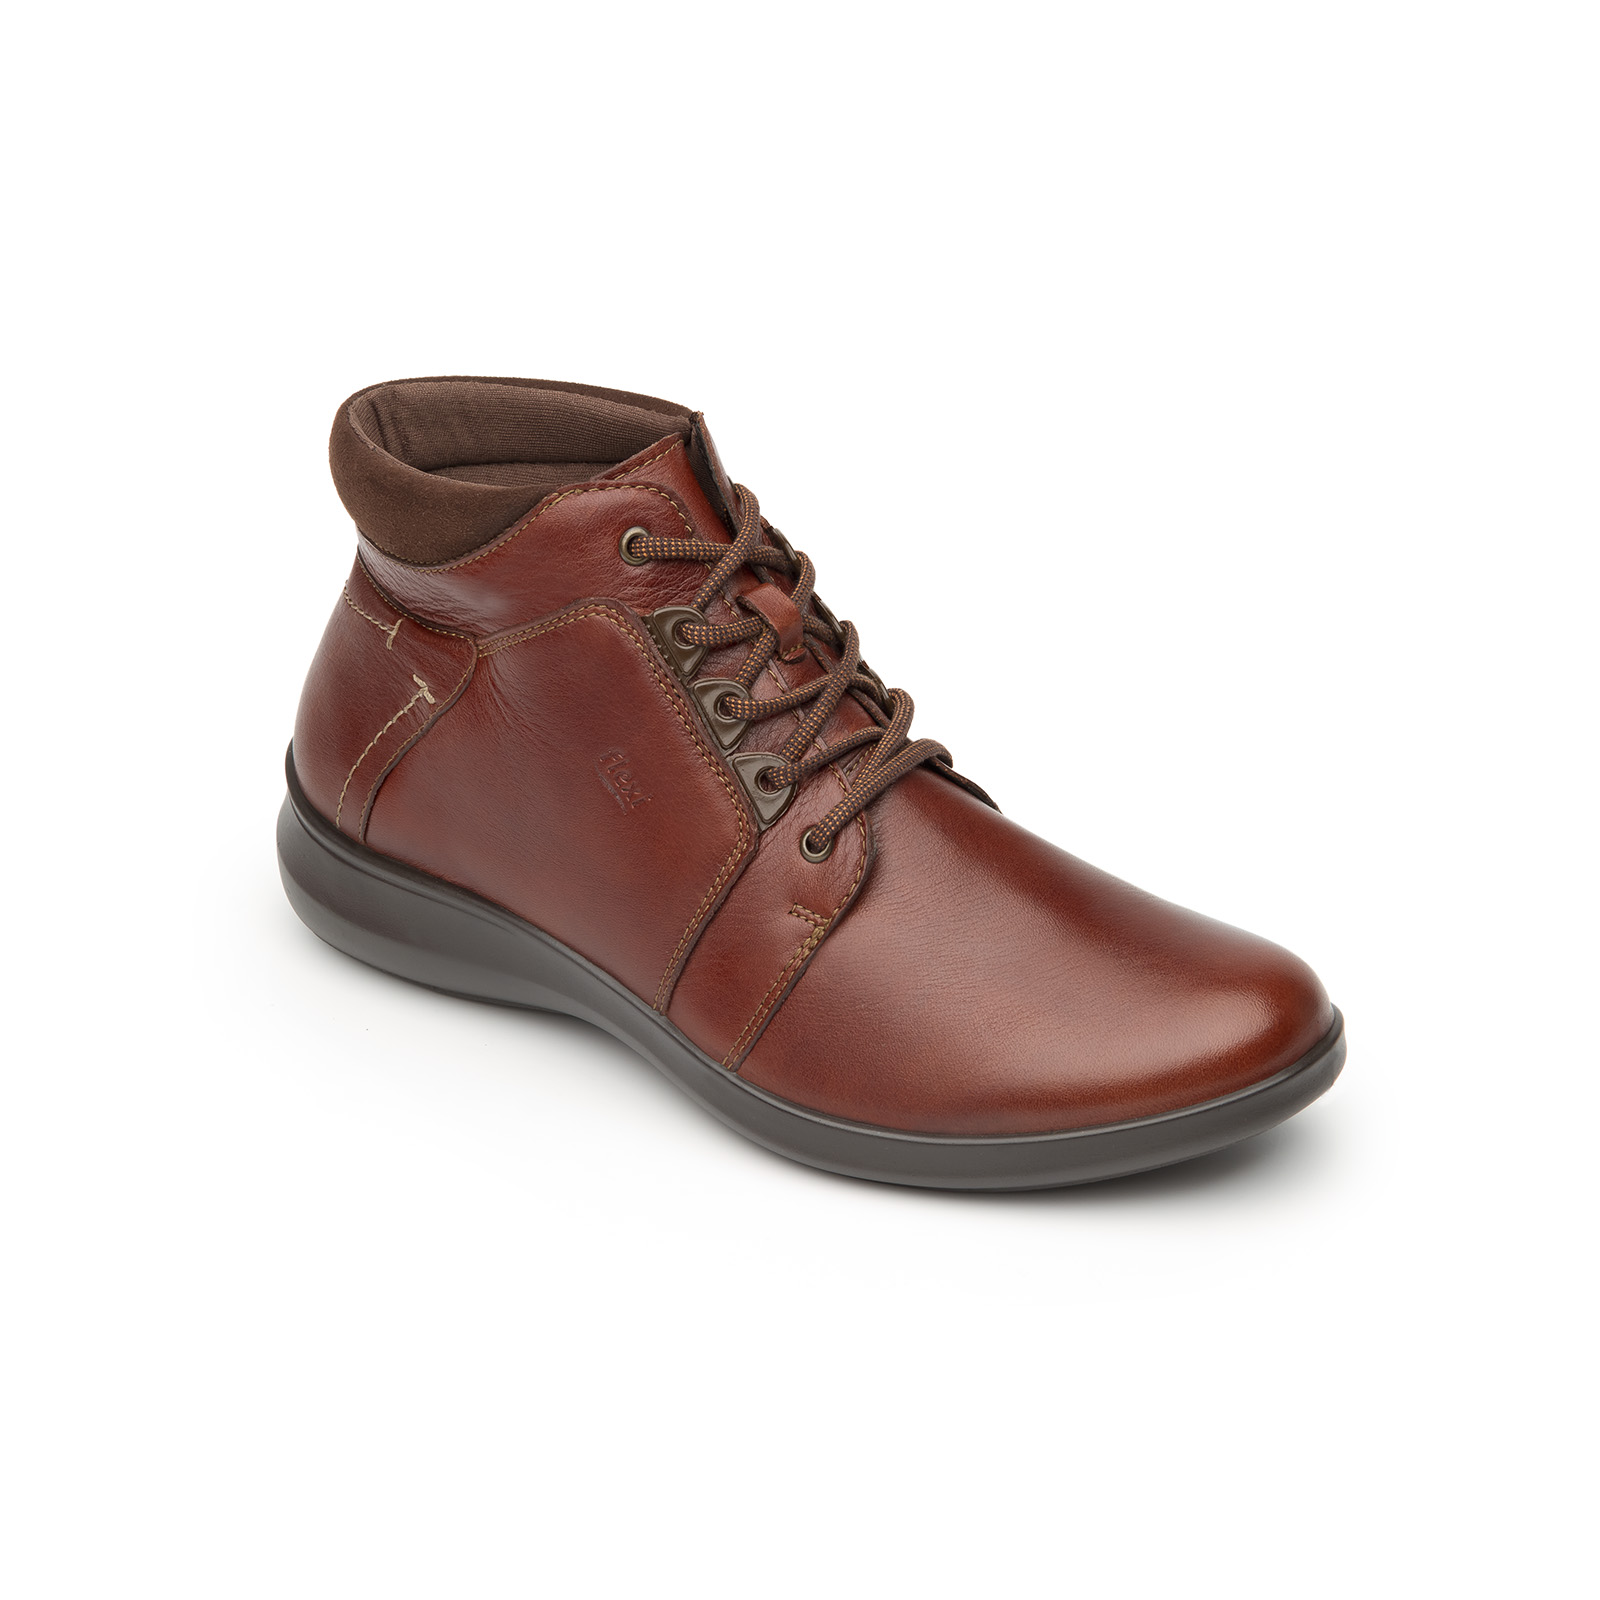 d553636c167 Botas para Dama Flexi al mejor precio - Zapatos Flexi México